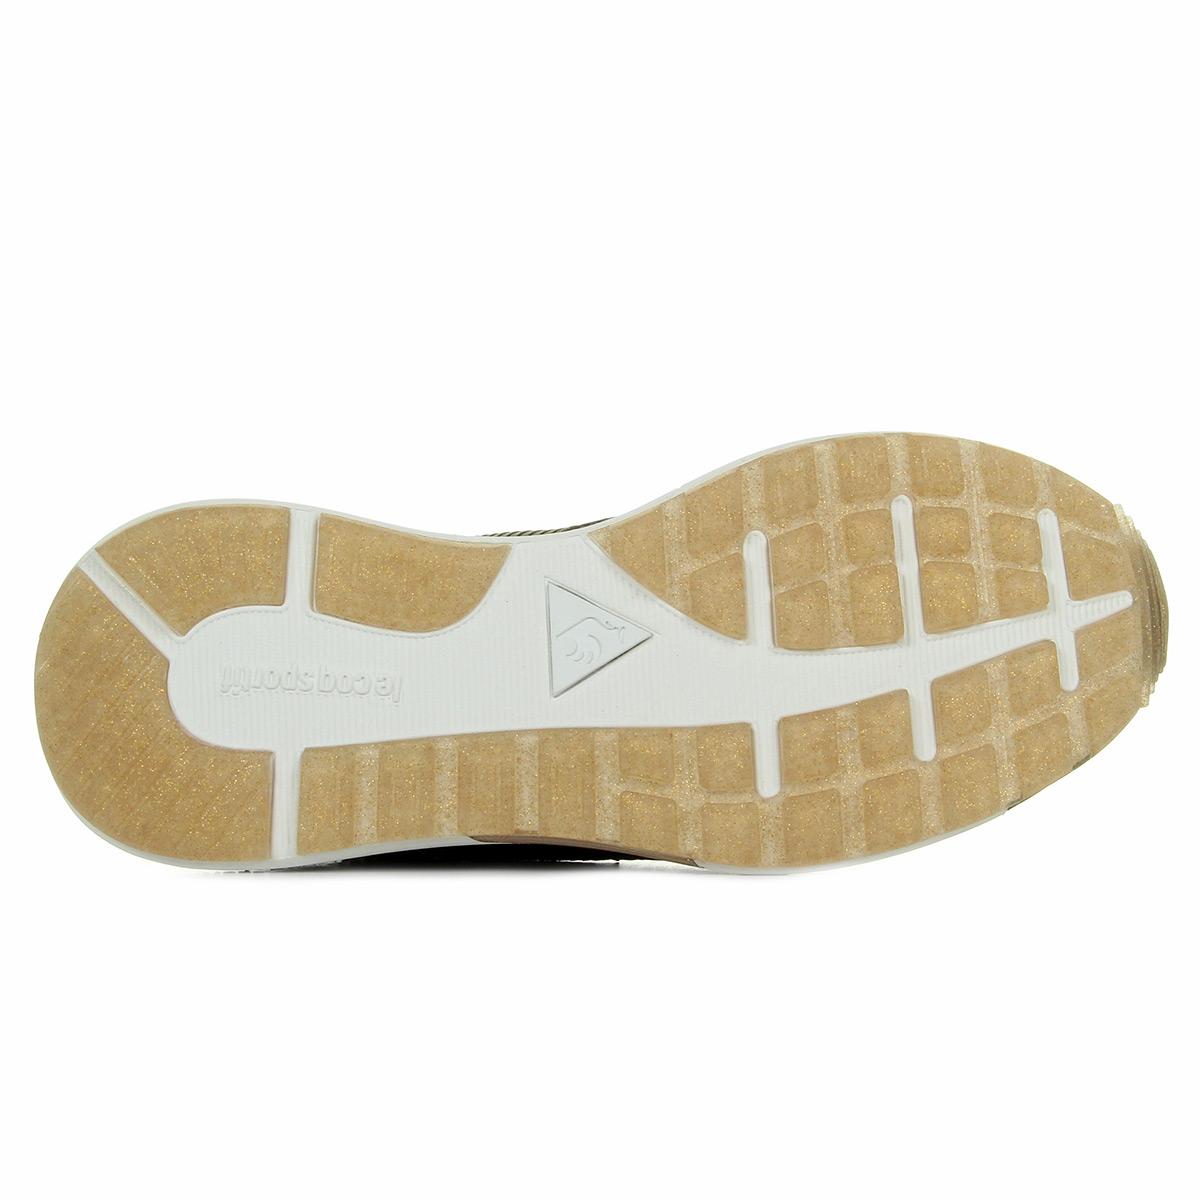 Le Coq Sportif Omega X W Stripped Sock Metallic Olive 1721179, Baskets mode femme